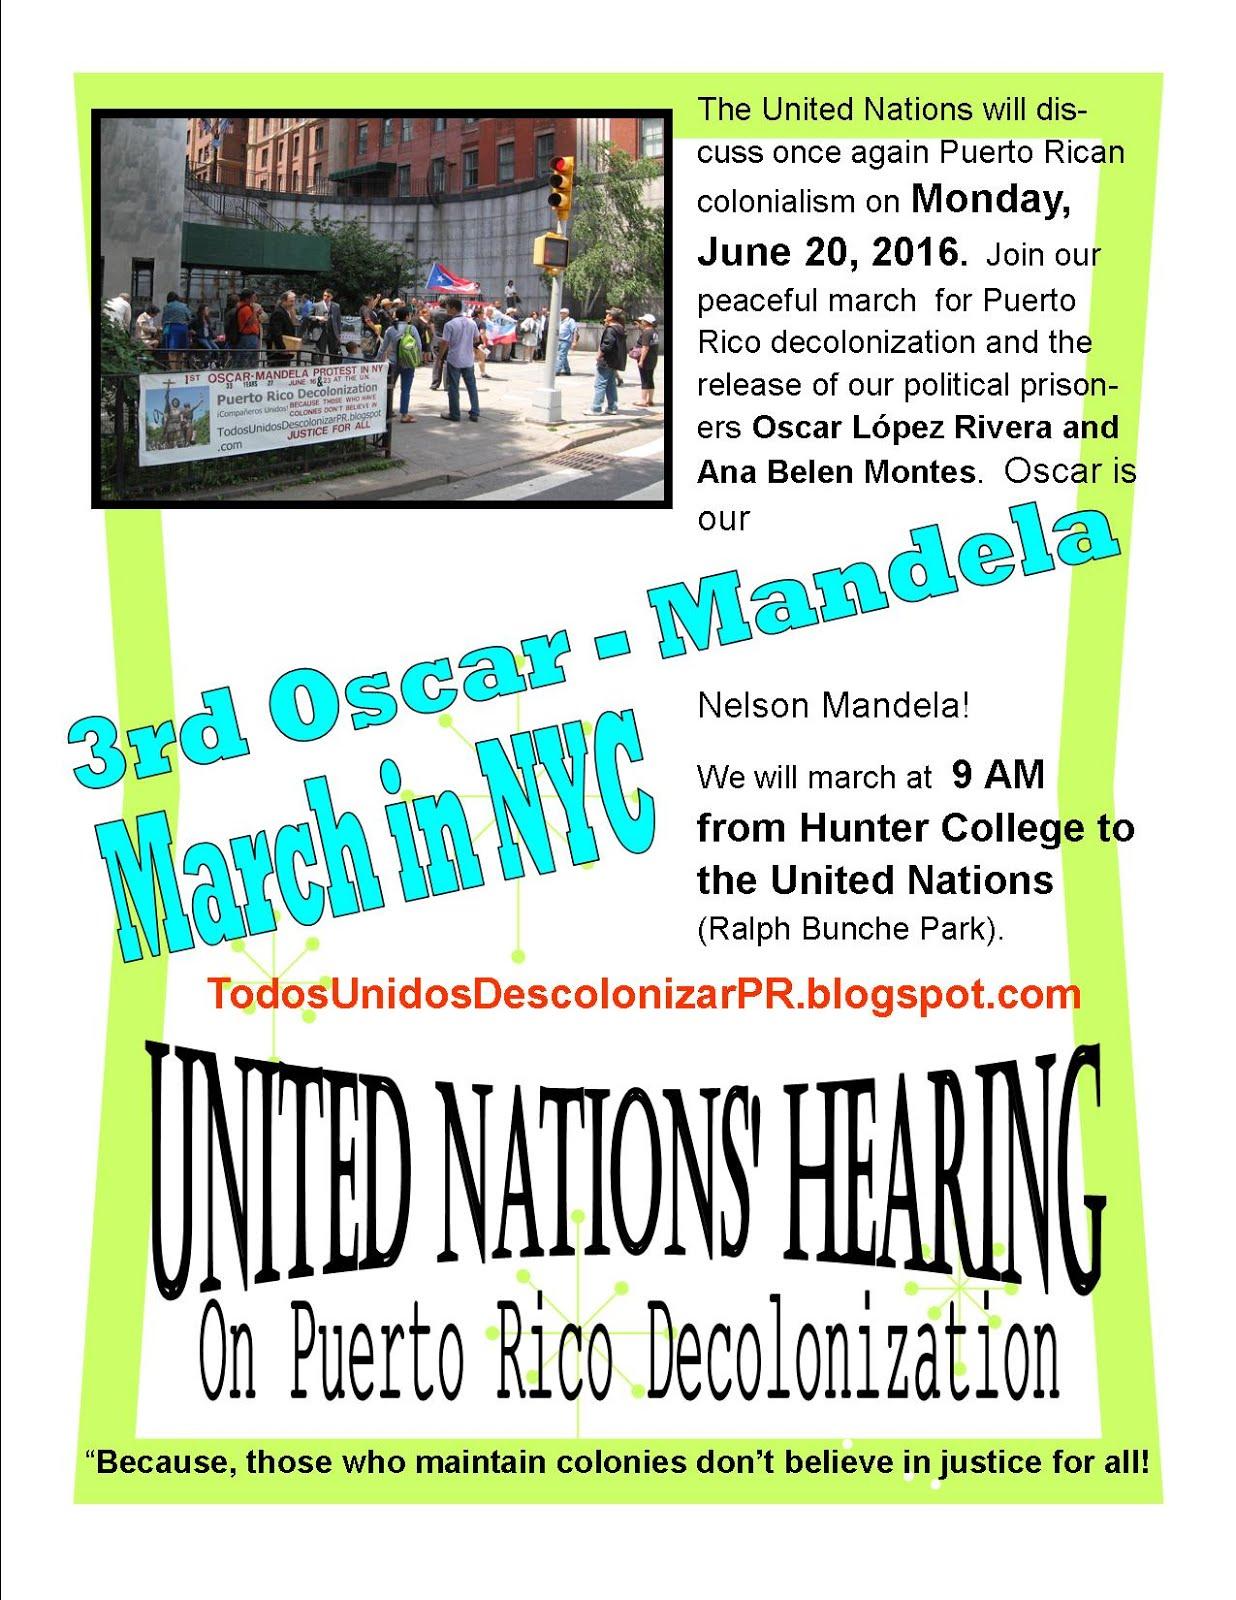 3ra Marcha Oscar - Mandela en NYC 2016